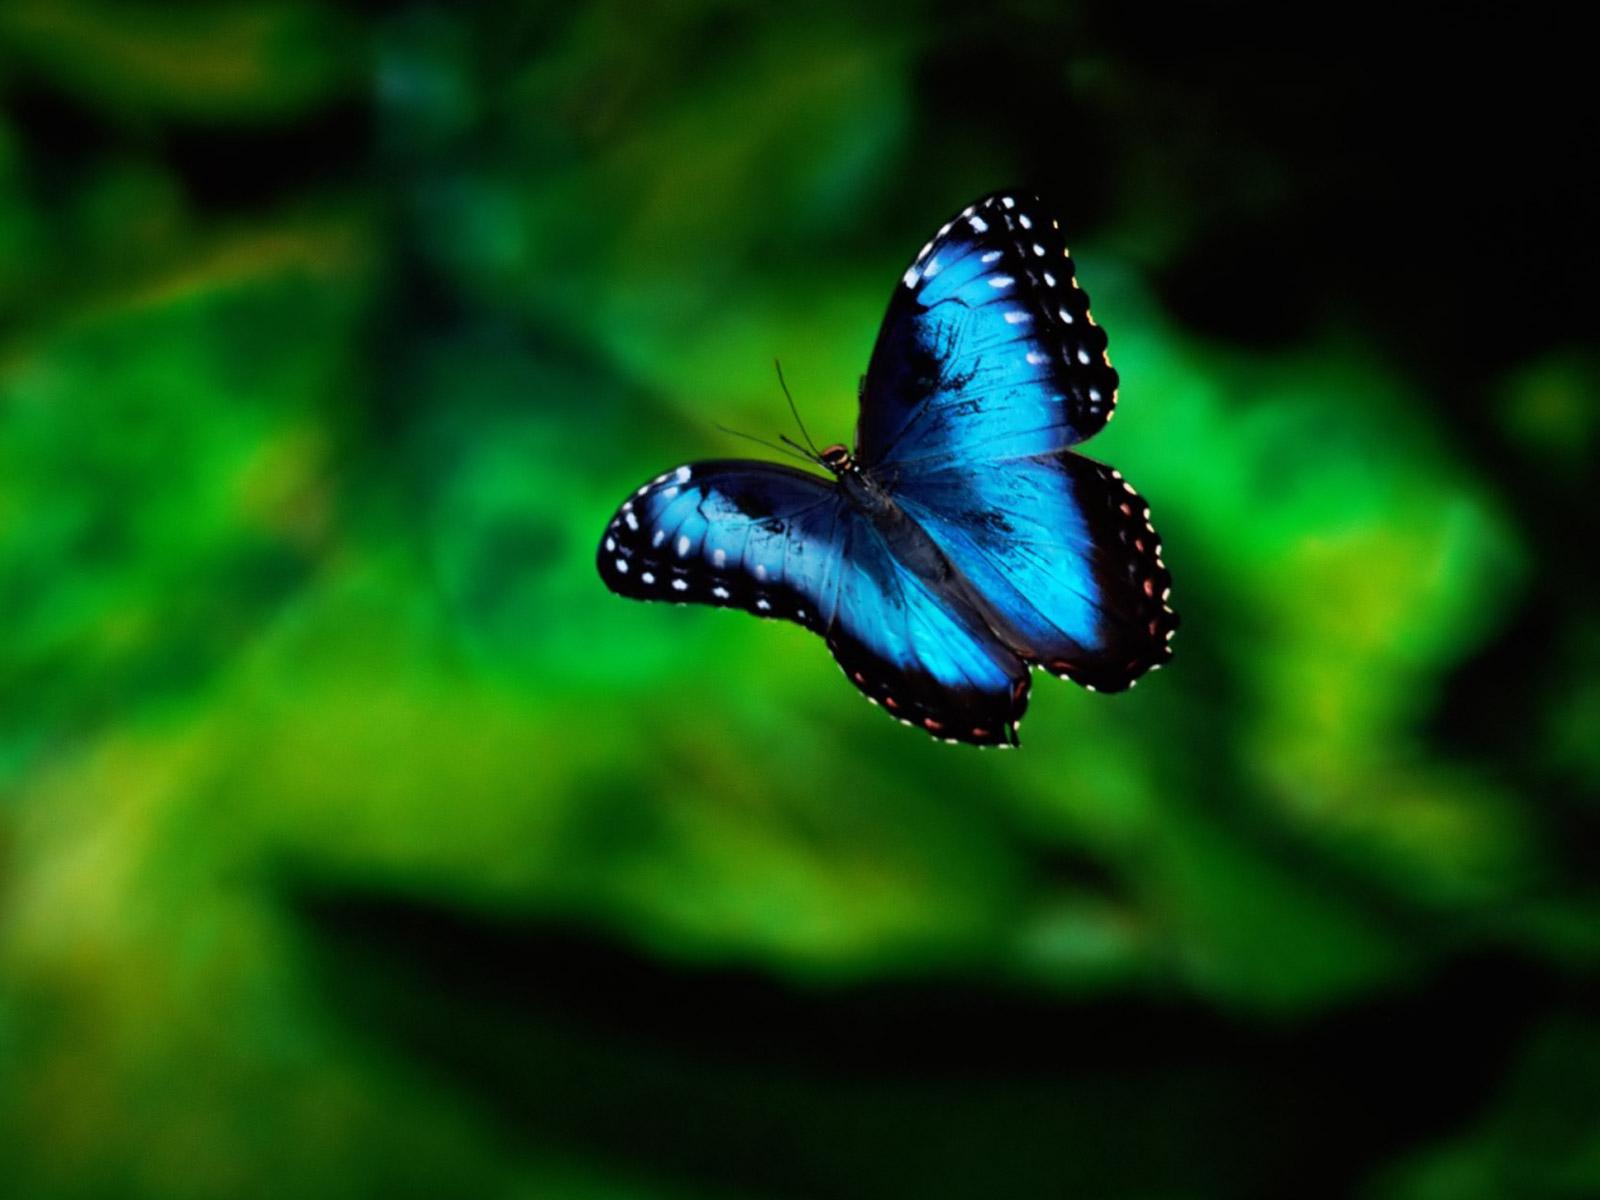 Blue Butterfly   HD Animal Wallpapers   Blue Butterfly 1600x1200